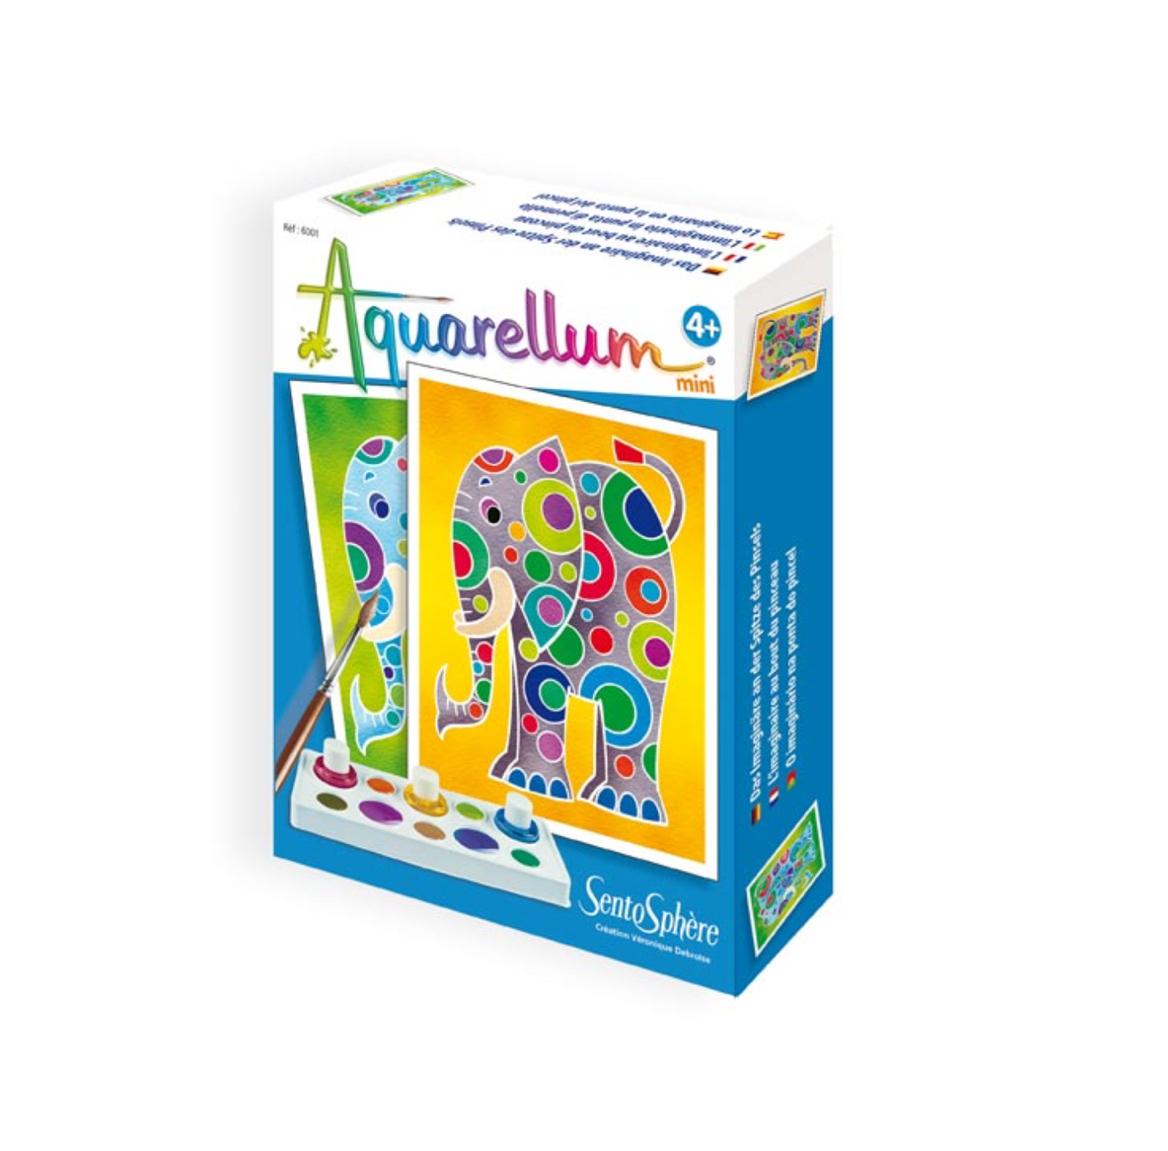 aquarellum-mini-elefantes-de-sentosphe-e-en-el-mundo-de-mico-3